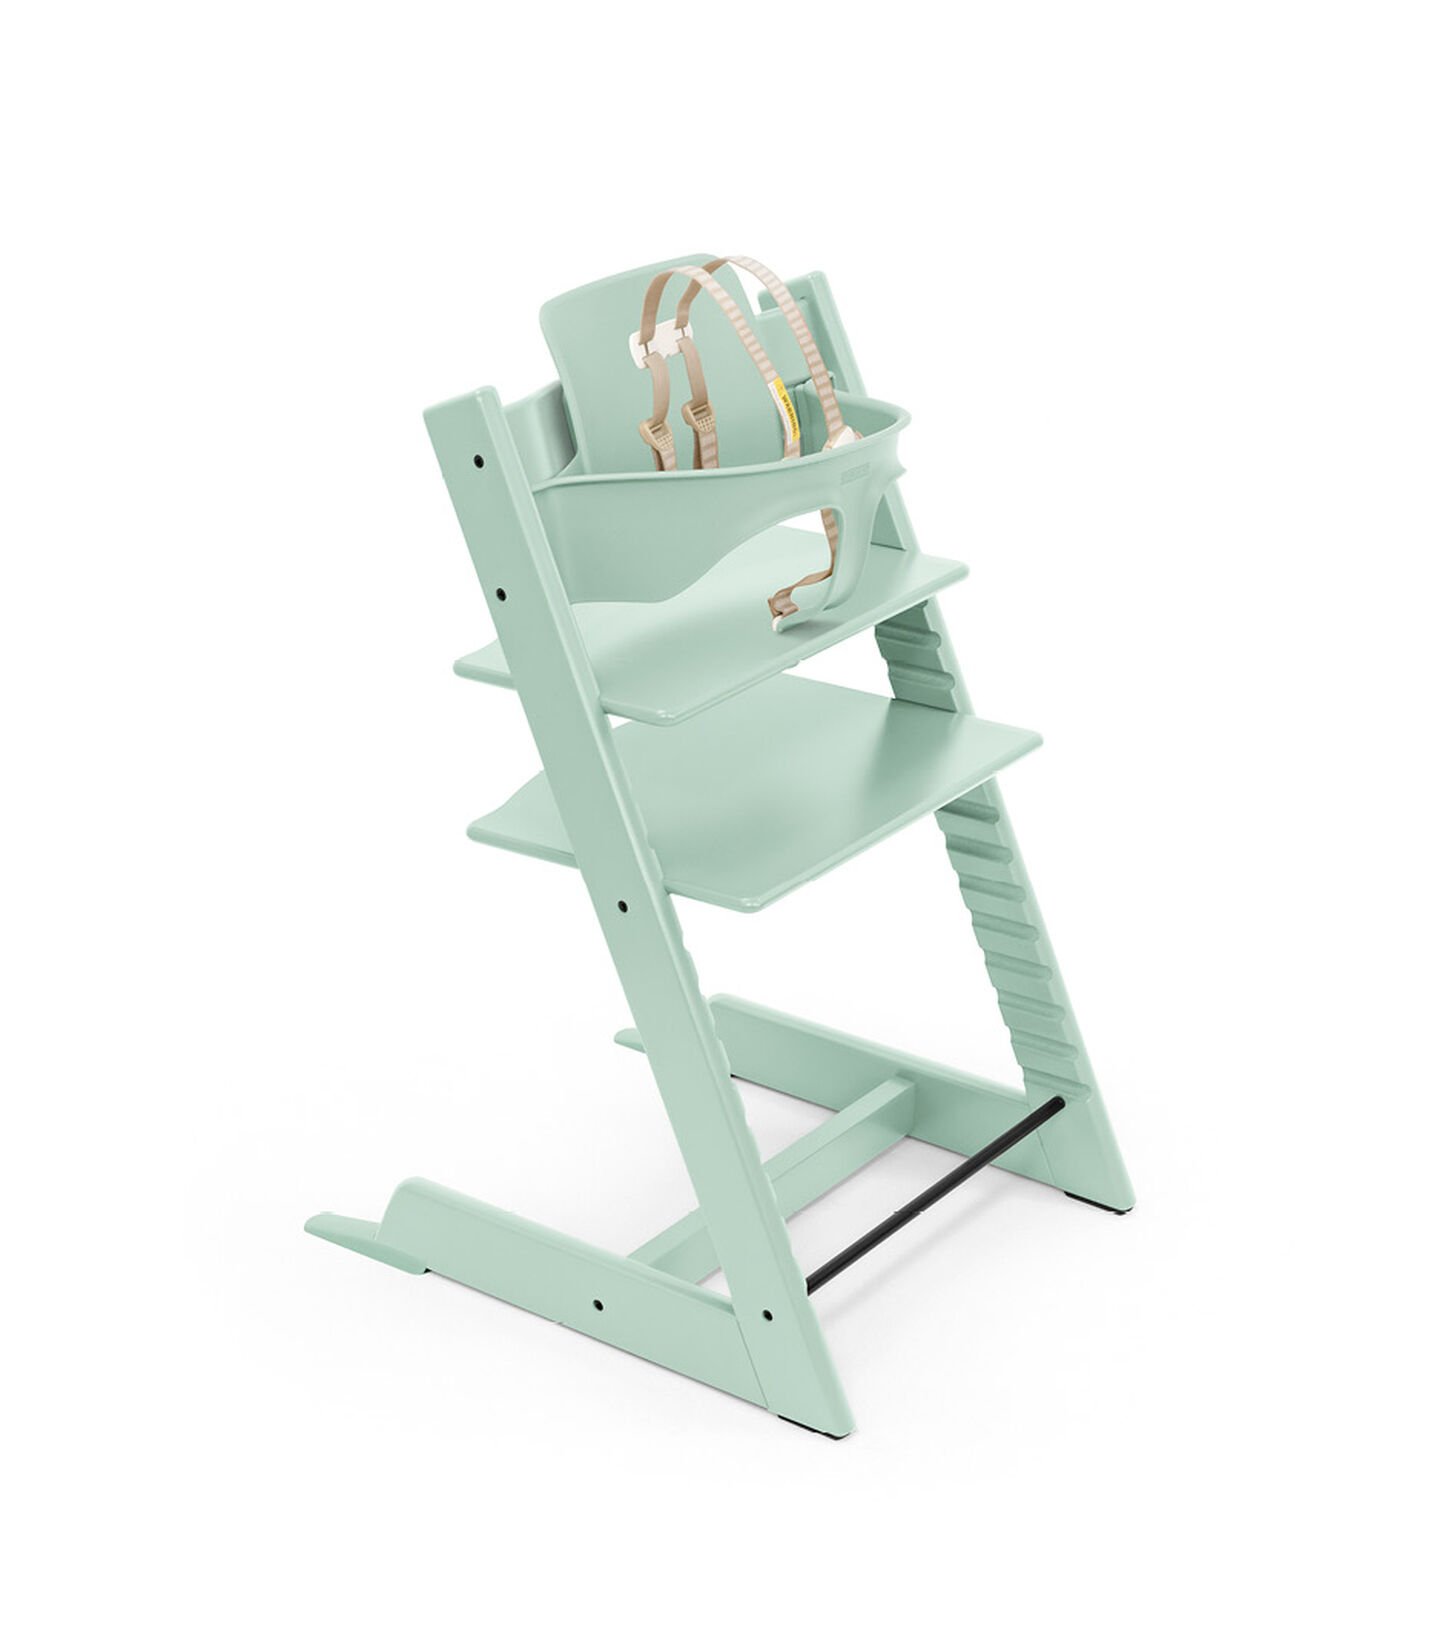 Tripp Trapp® Bundle High Chair US 20 Soft Mint, Soft Mint, mainview view 2